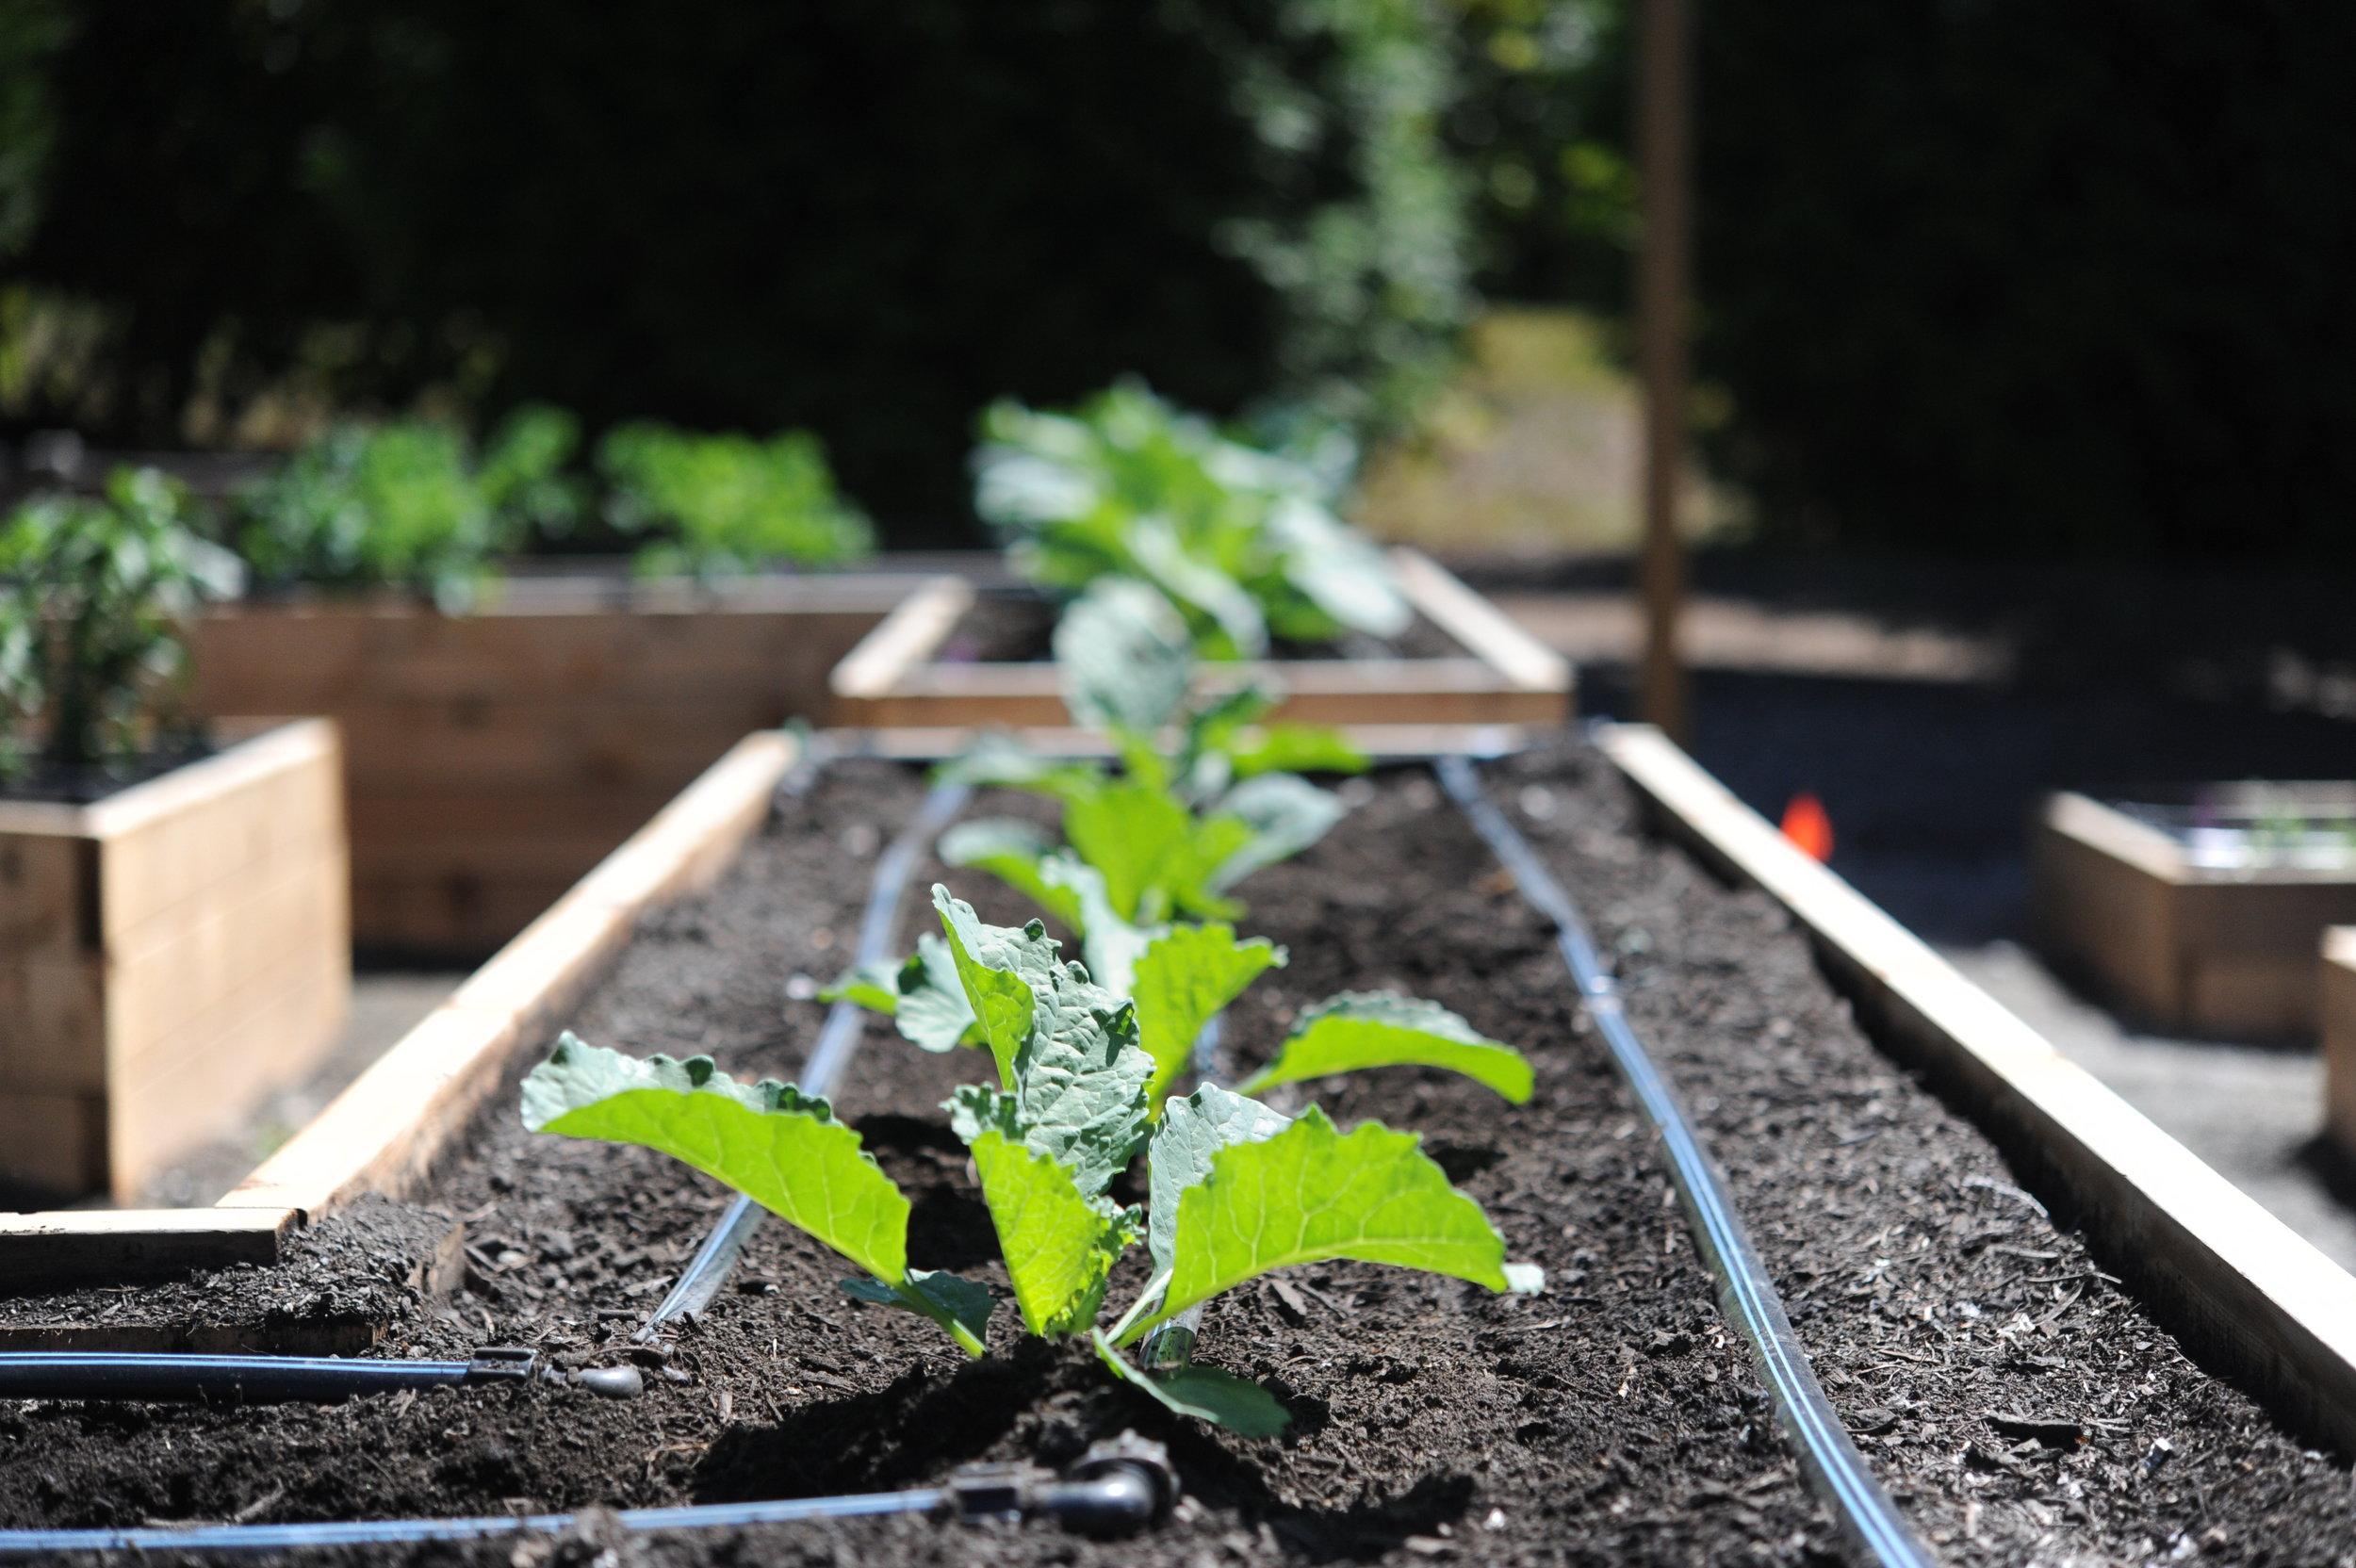 Drip Irrigation_Seattle Urban Farm Co_Encyclopedia Botanica